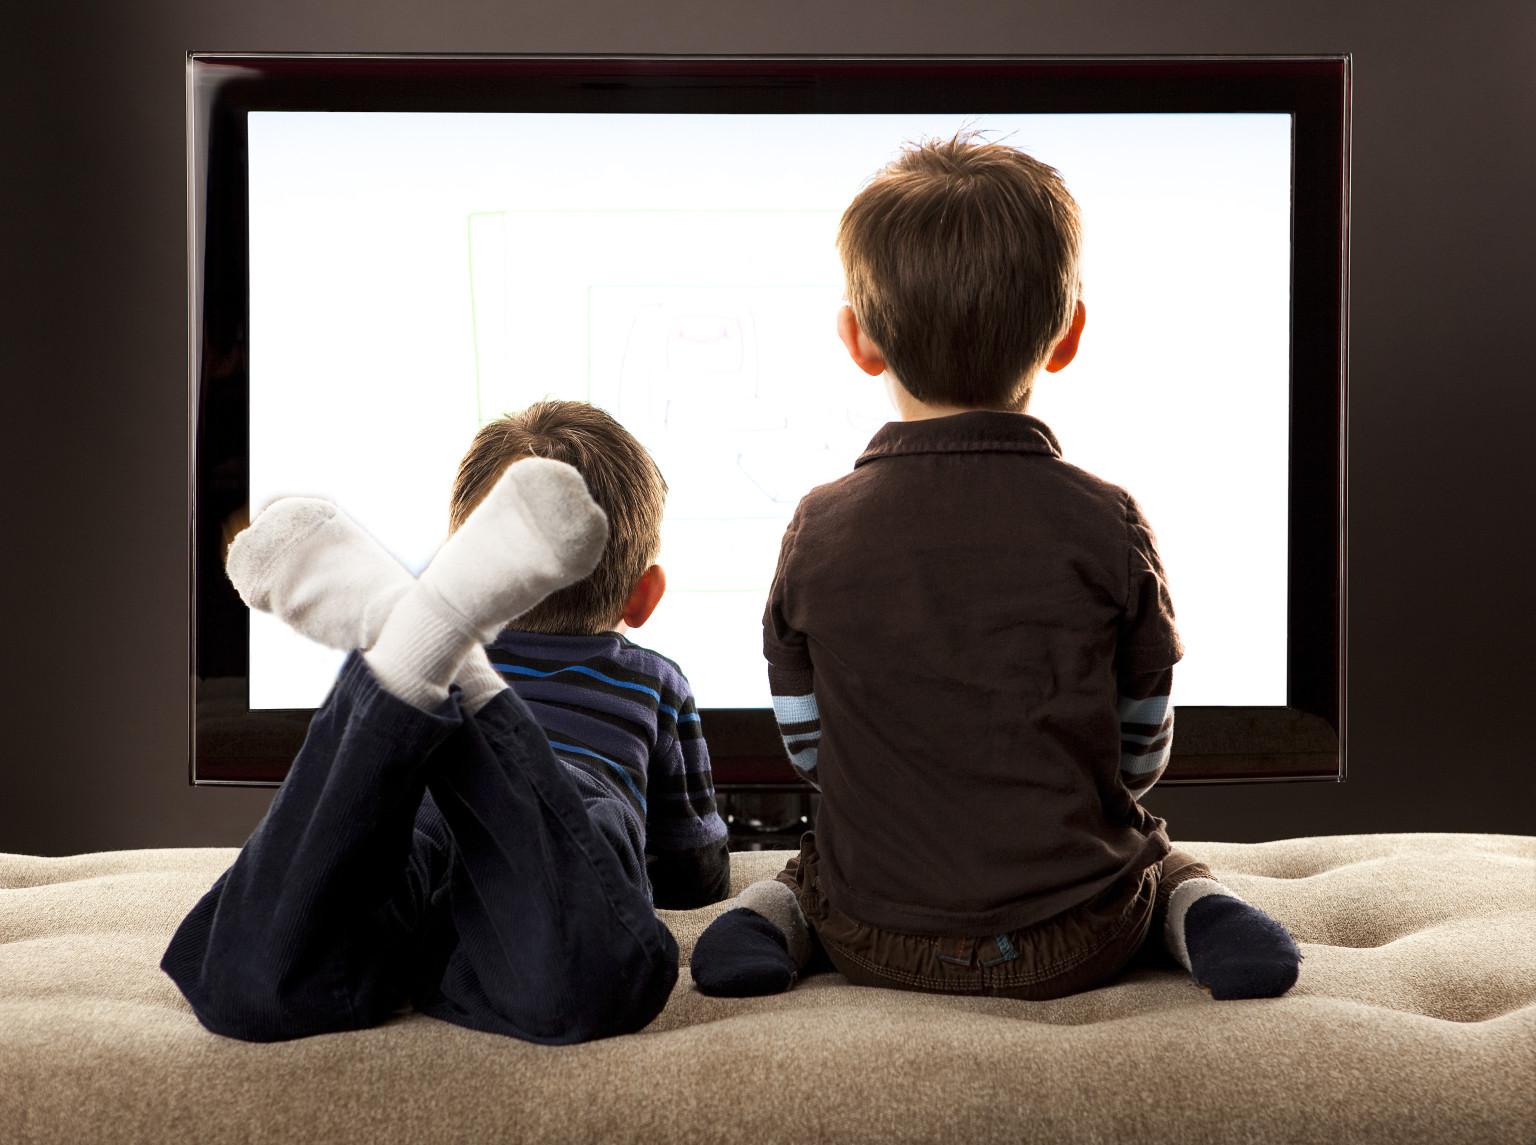 Televizijos poveikis